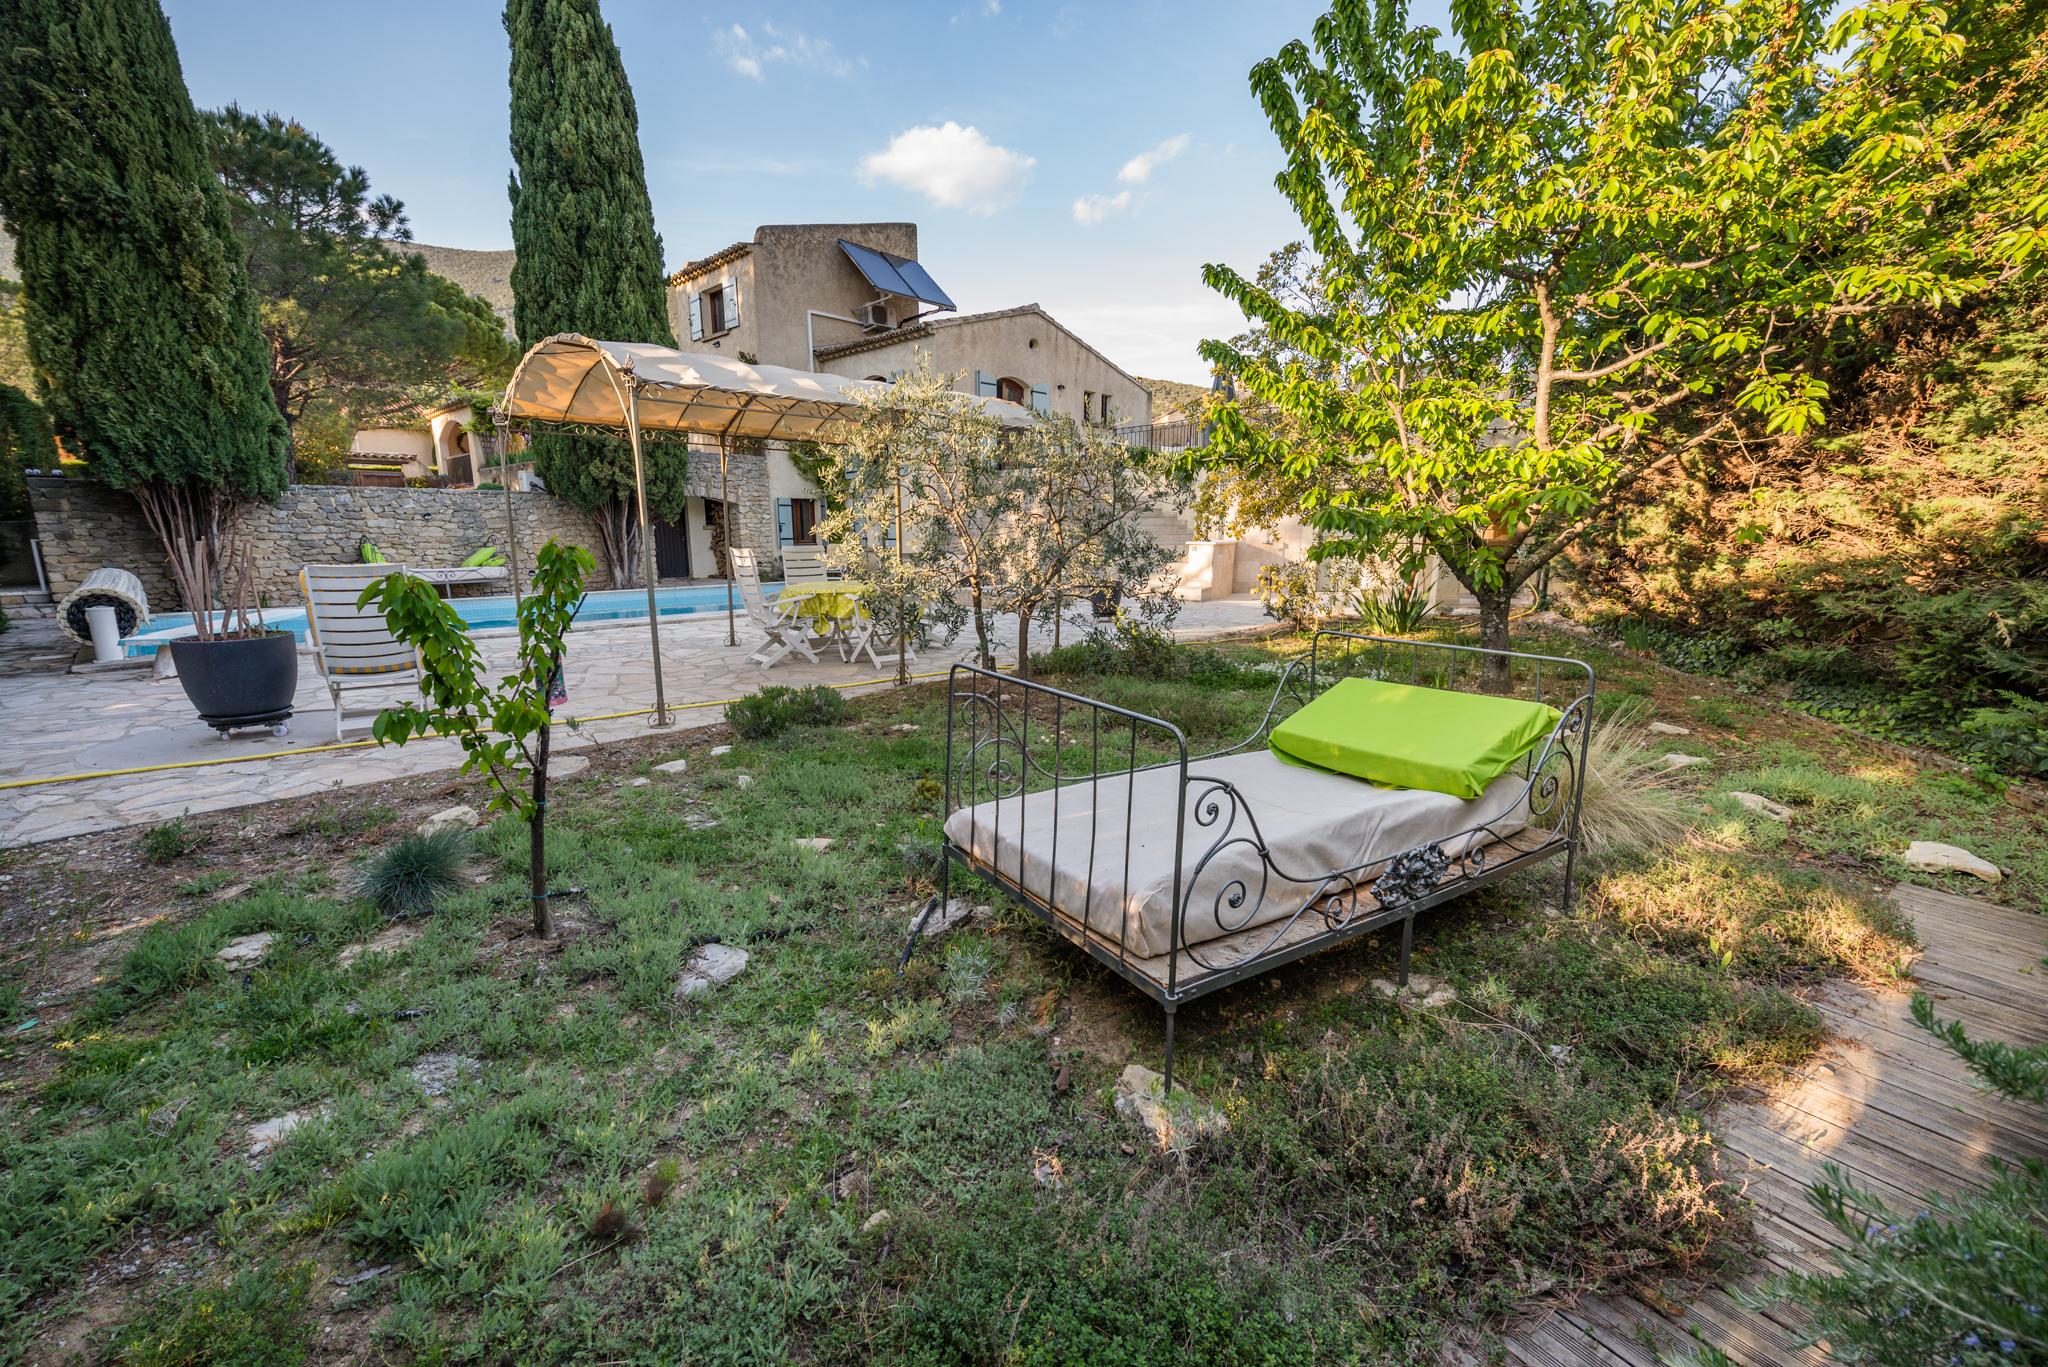 feriebolig-provence-privat-pool-DSC_4682.jpg